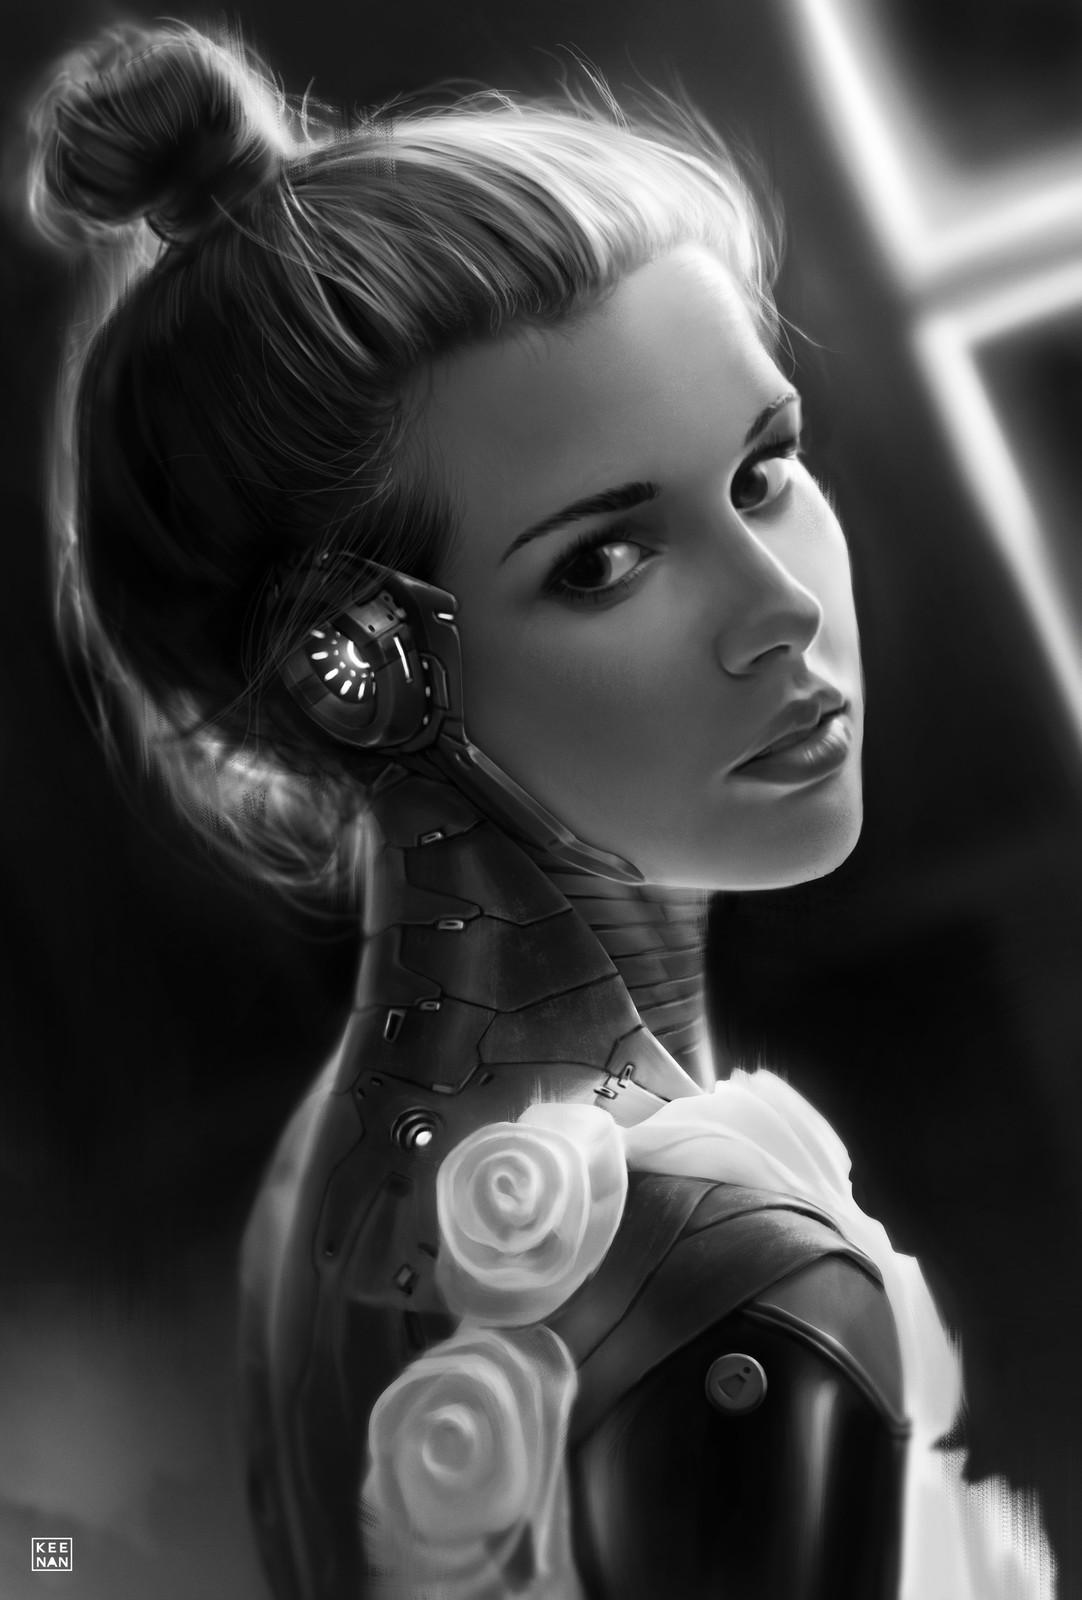 CyberPunk 2041 Portrait